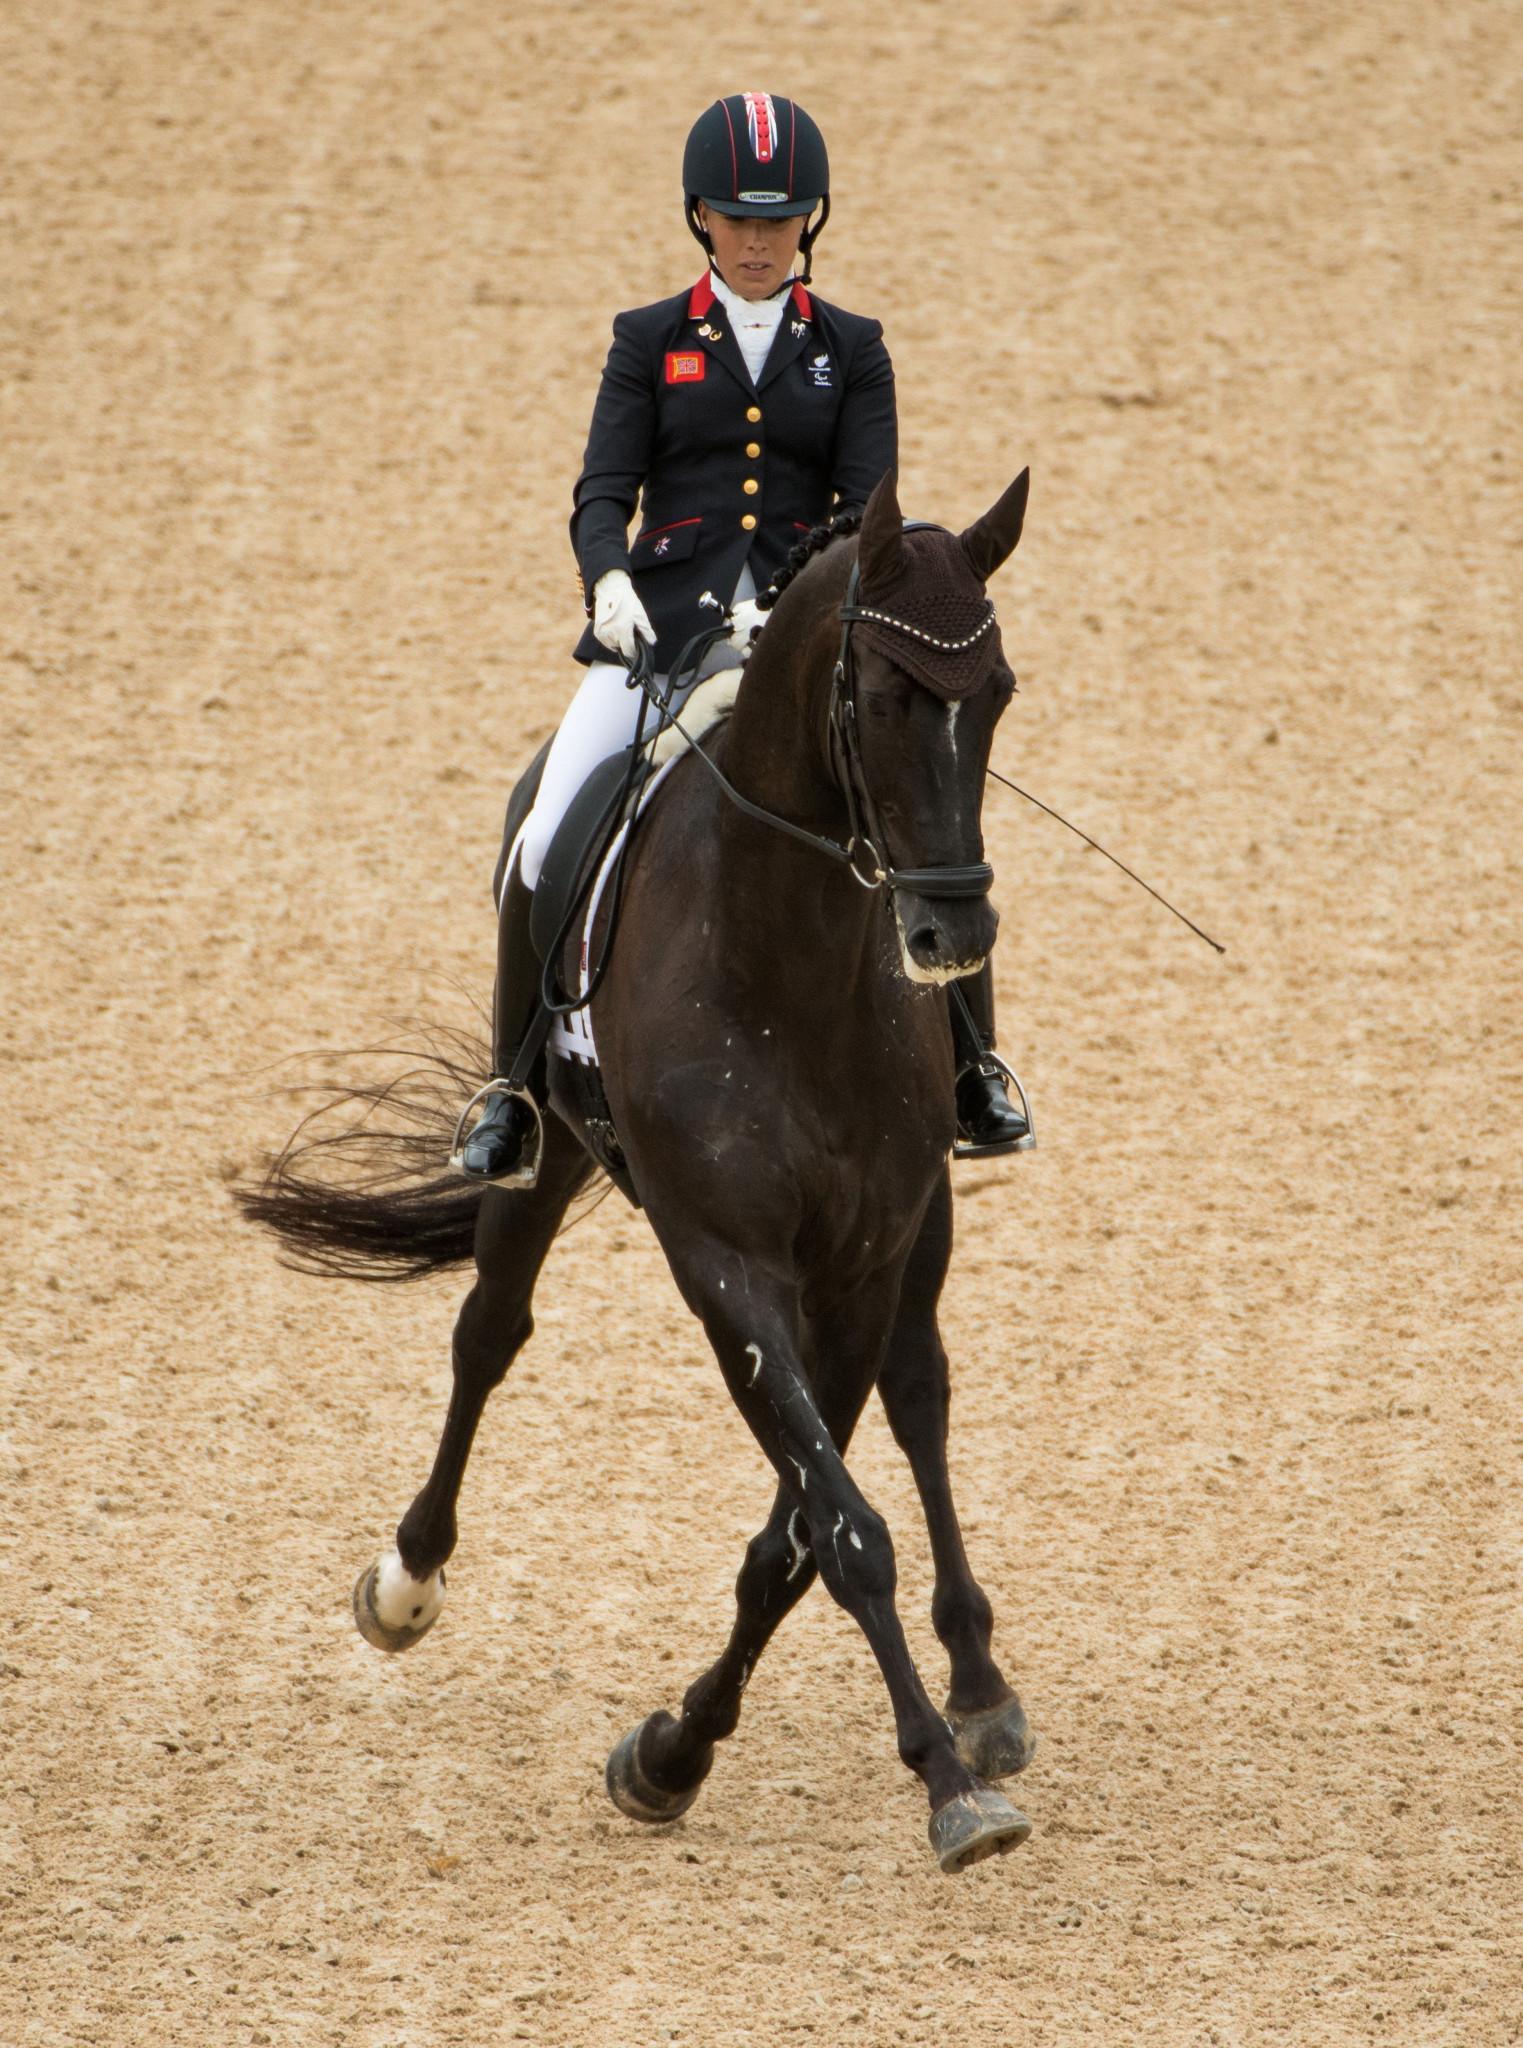 Wells hopeful fresh faces can bring success for British Para-dressage team at European Championships